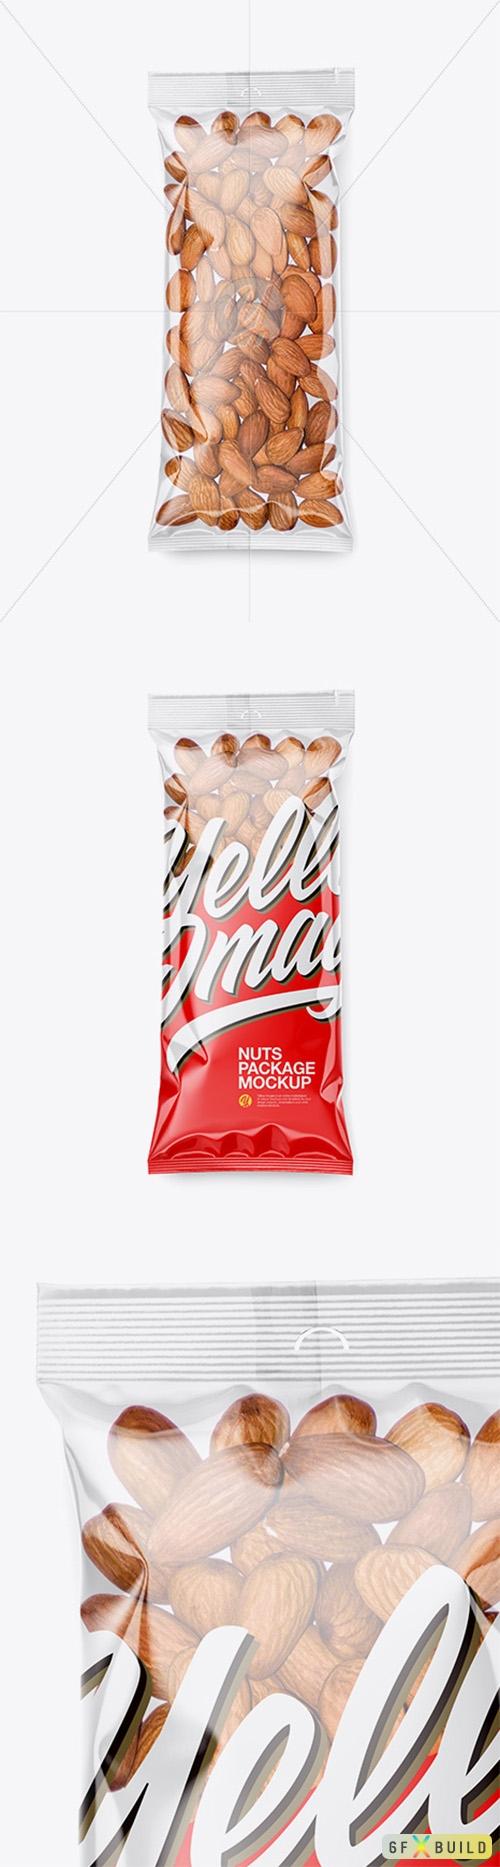 Clear Plastic Pack w/ Almonds Mockup 44084 TIF